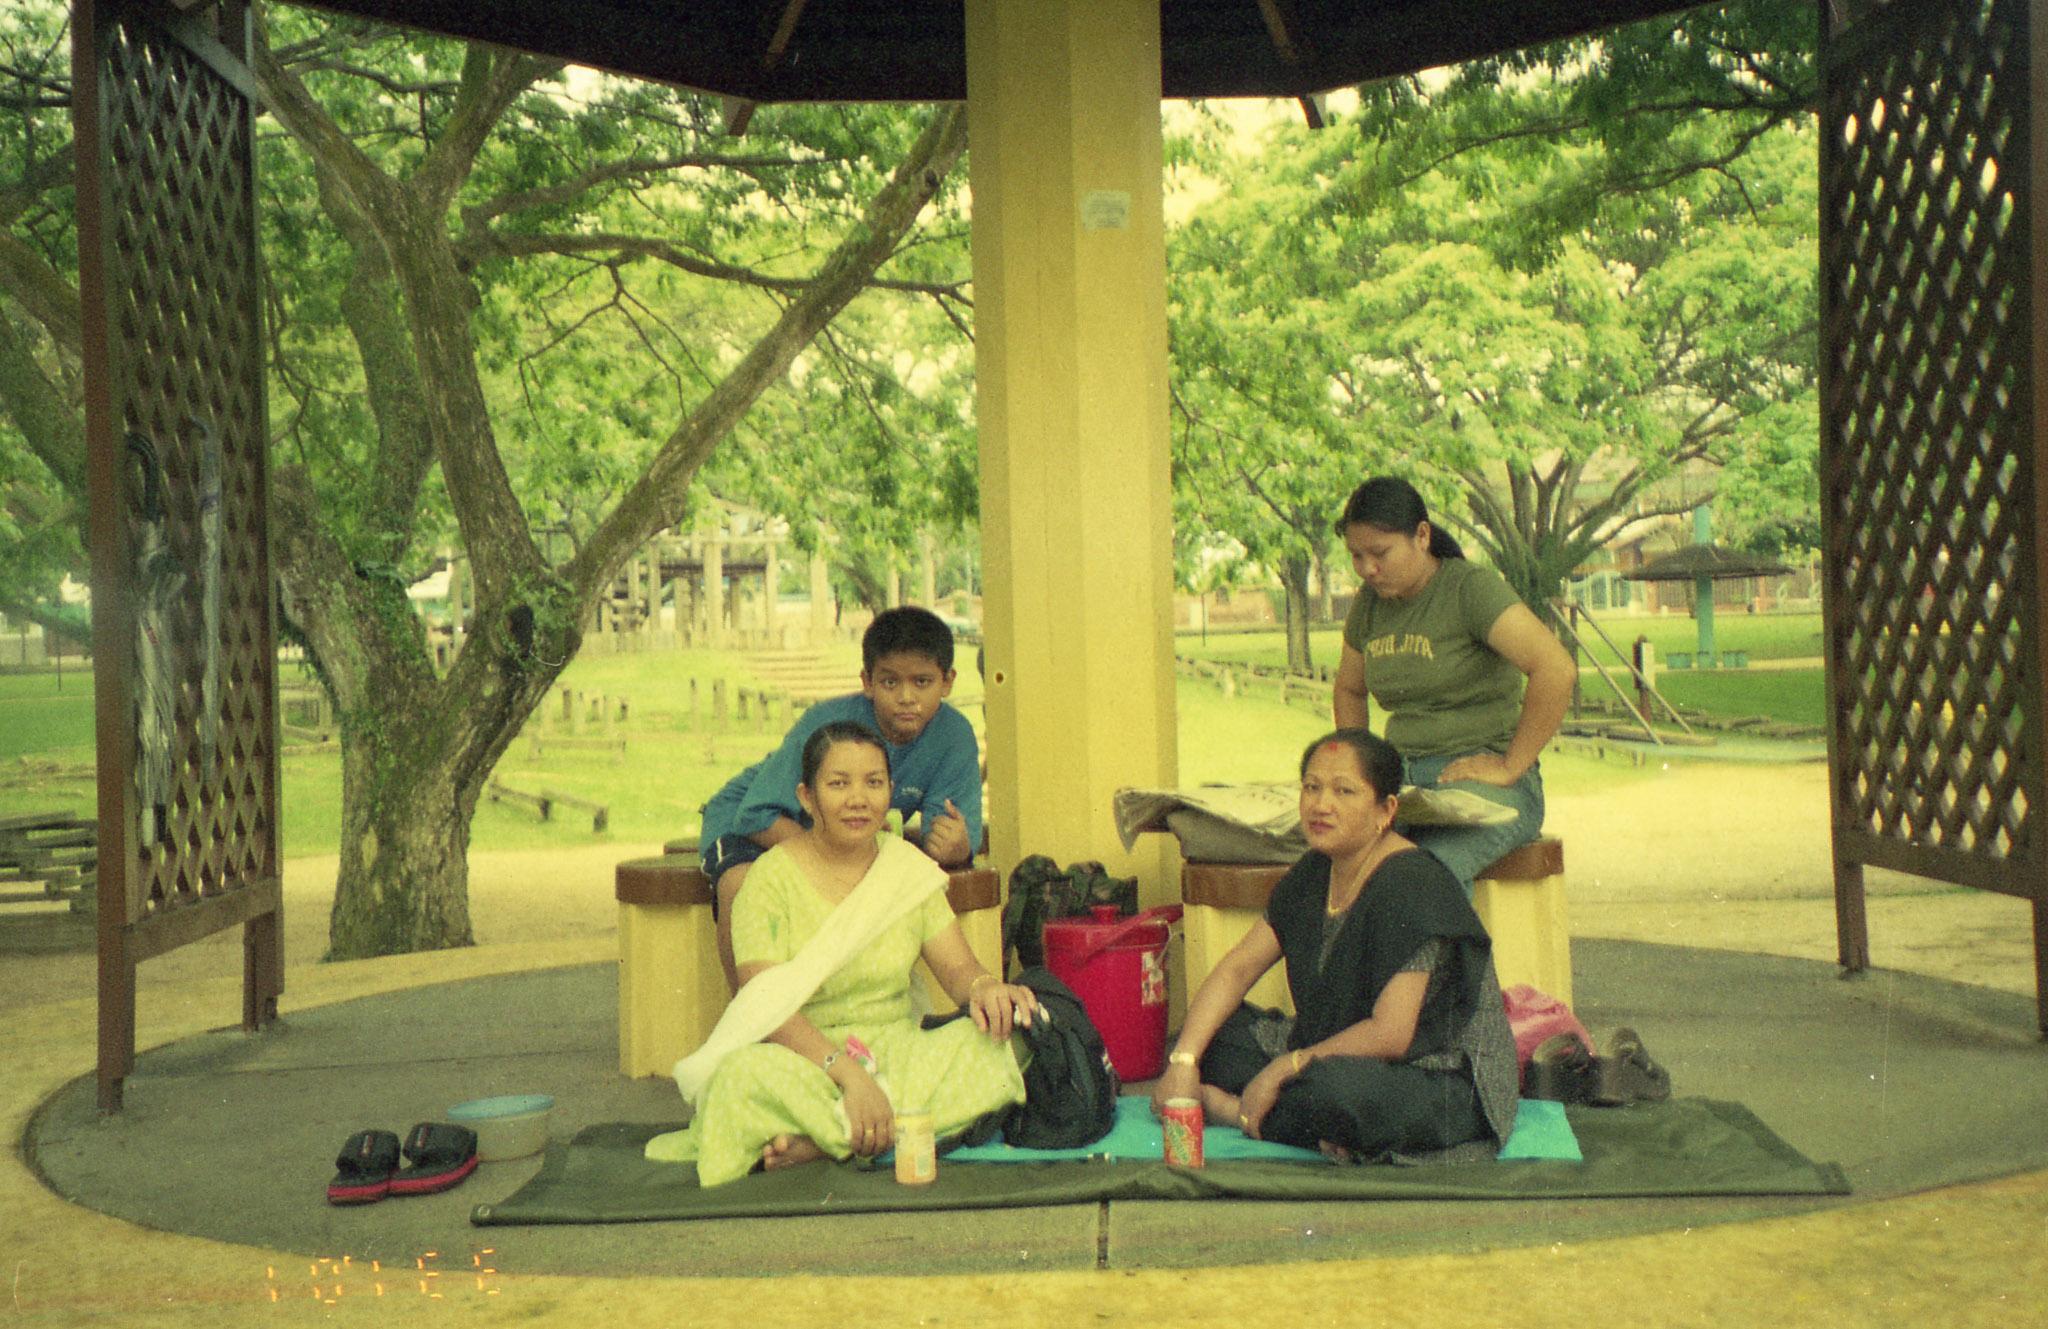 singapore-gurkhas-archive-photo-museum-zakaria-zainal-17.jpg